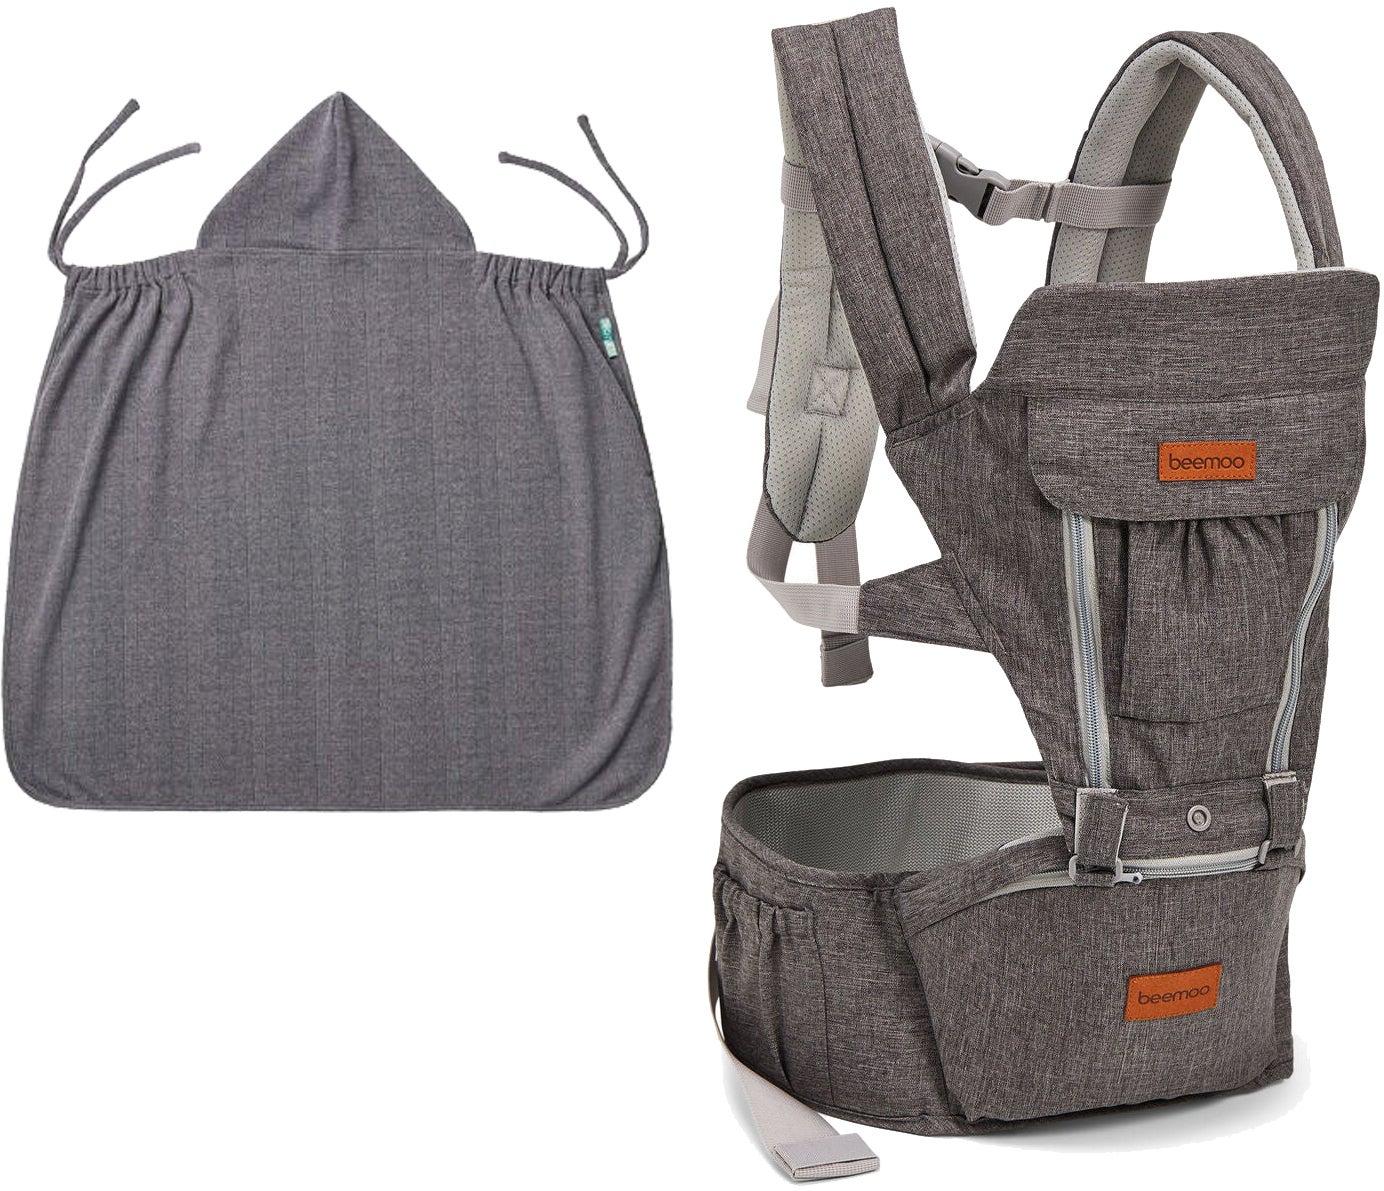 Beemoo Carry Comfort Adjust Bärsele inkl Överdrag, Grey